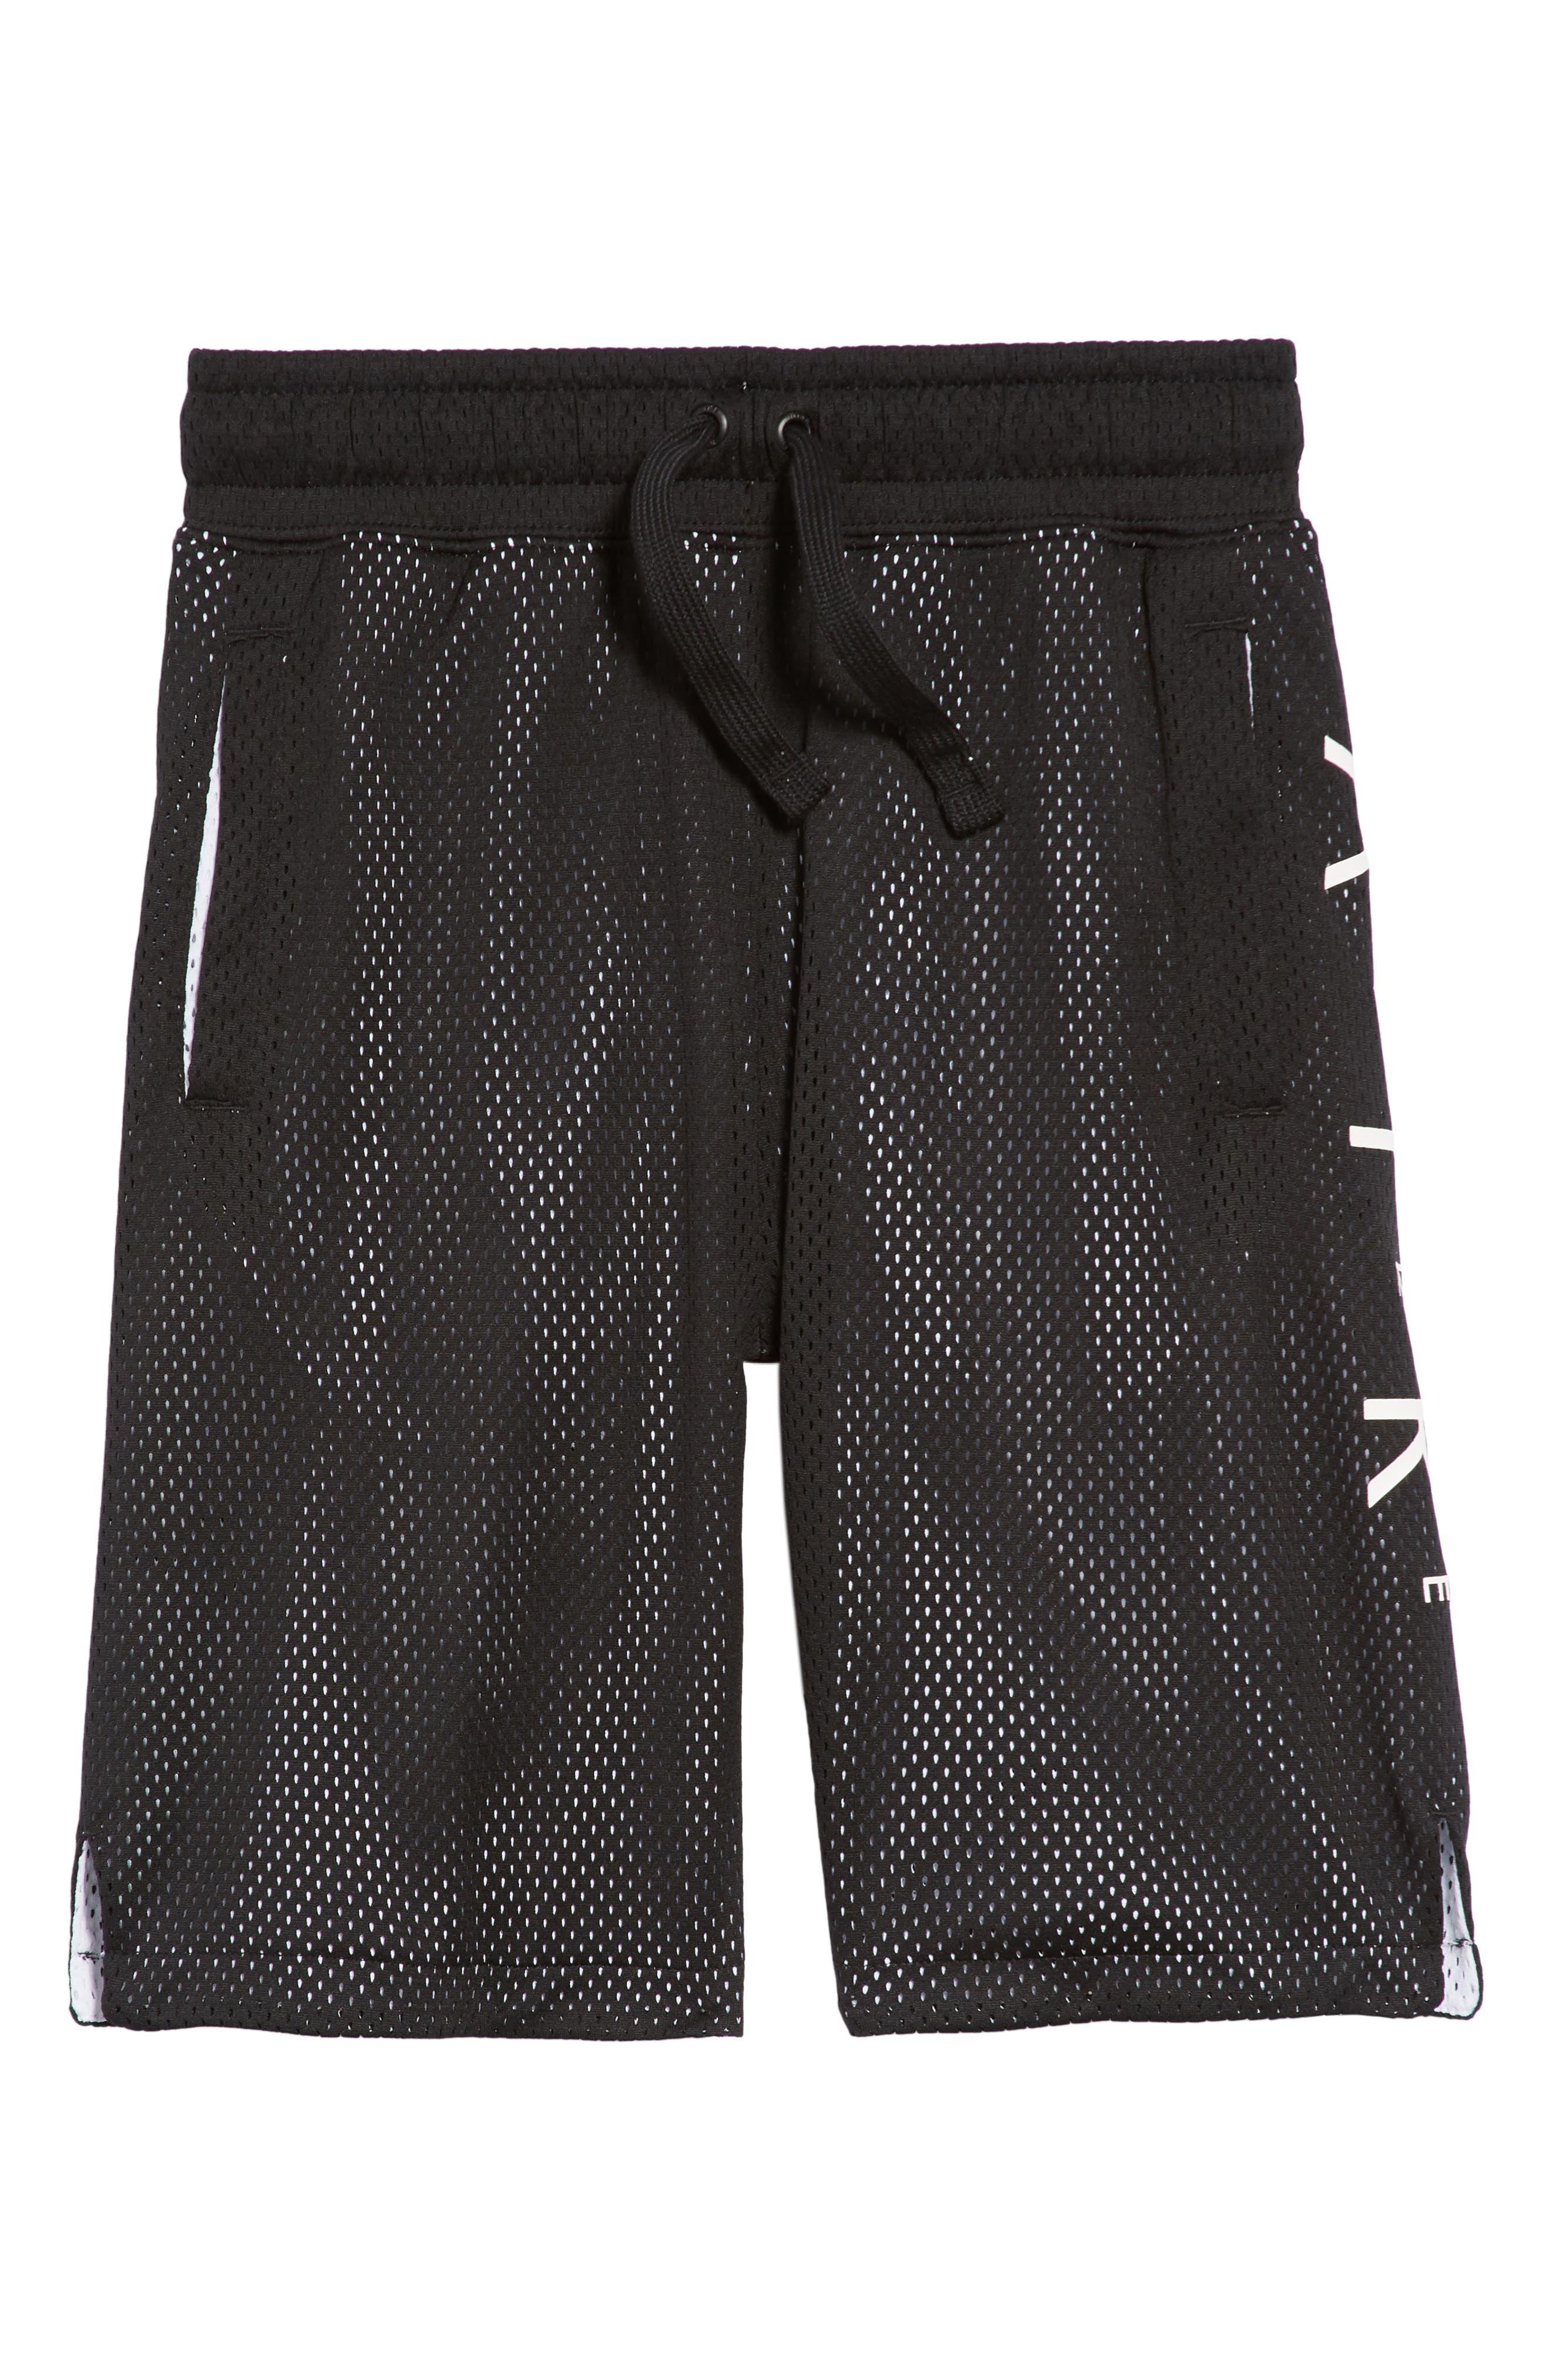 Sportswear Air Knit Shorts,                         Main,                         color, 010